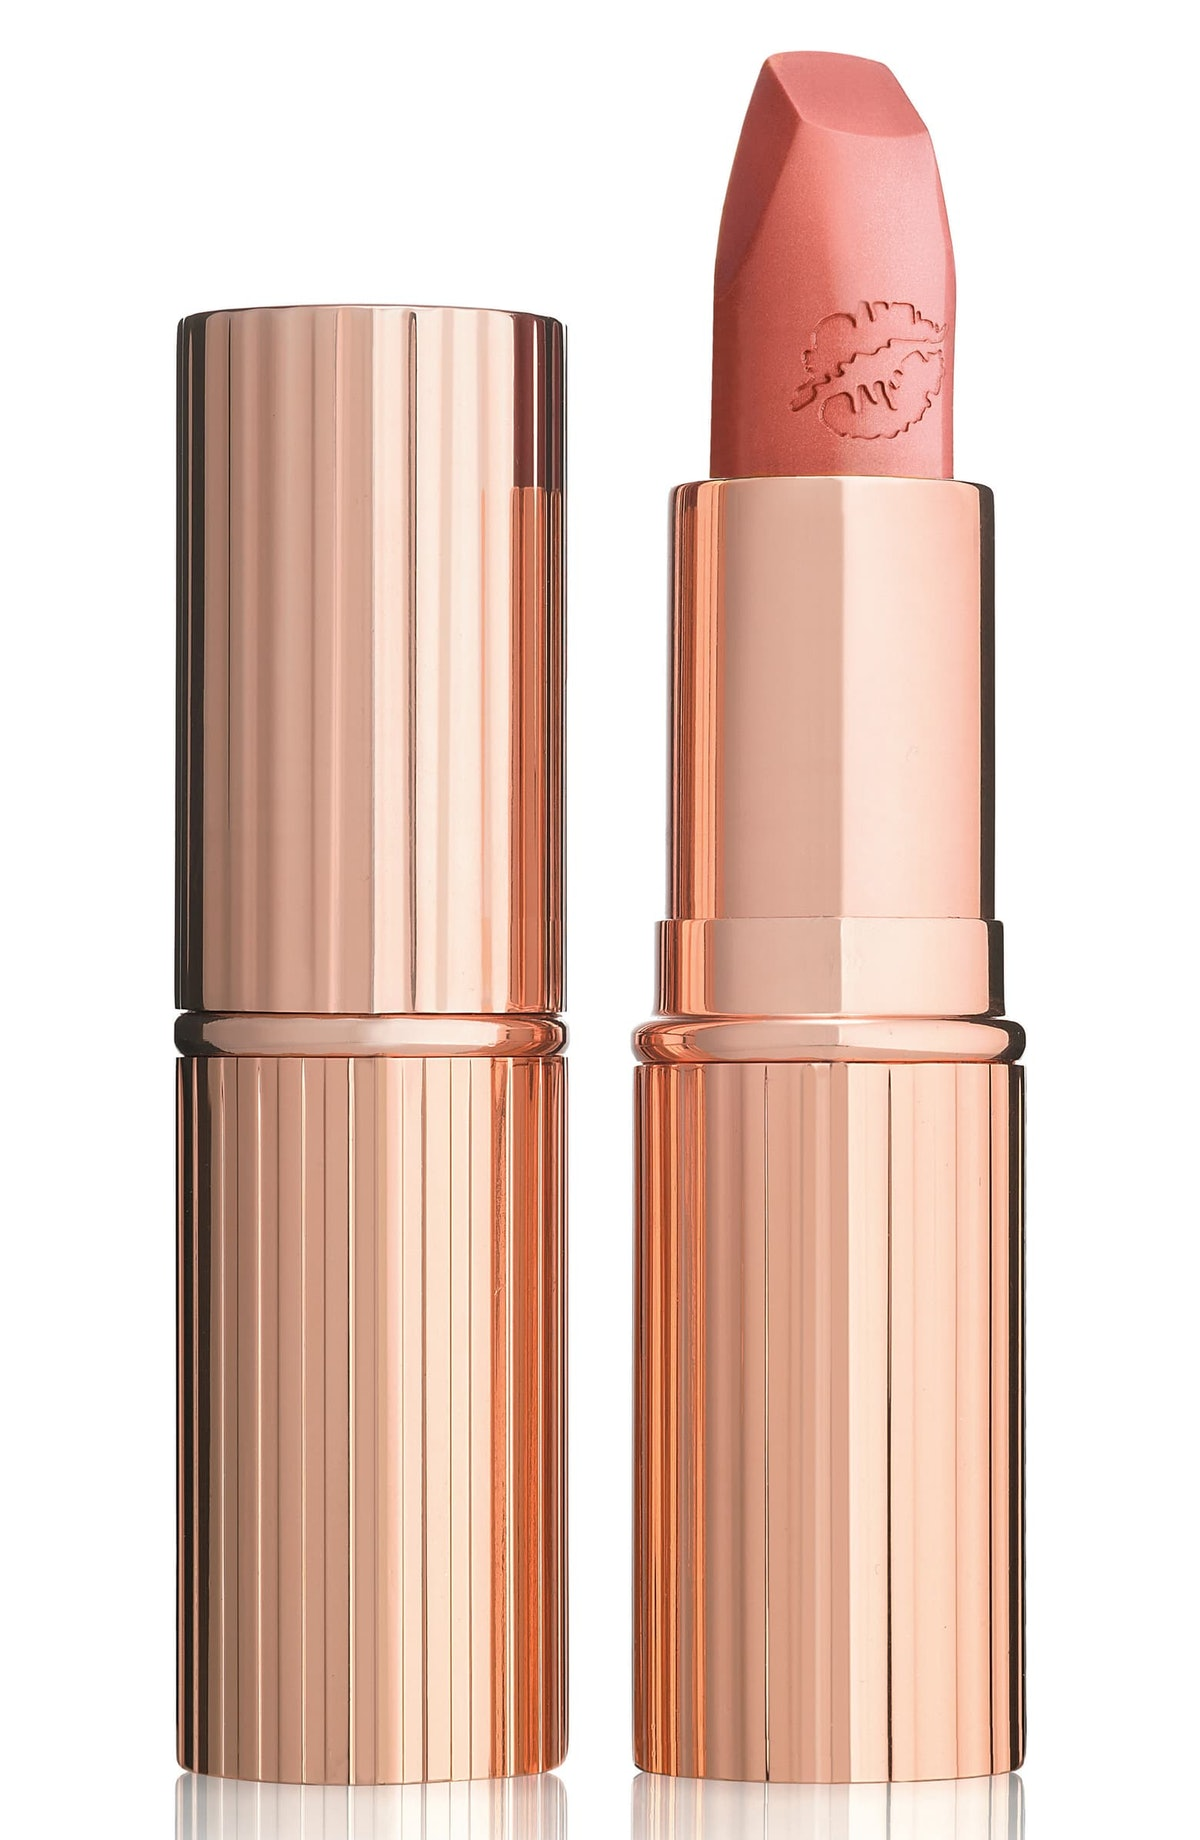 Hotlips Lipstick in Super Cindy